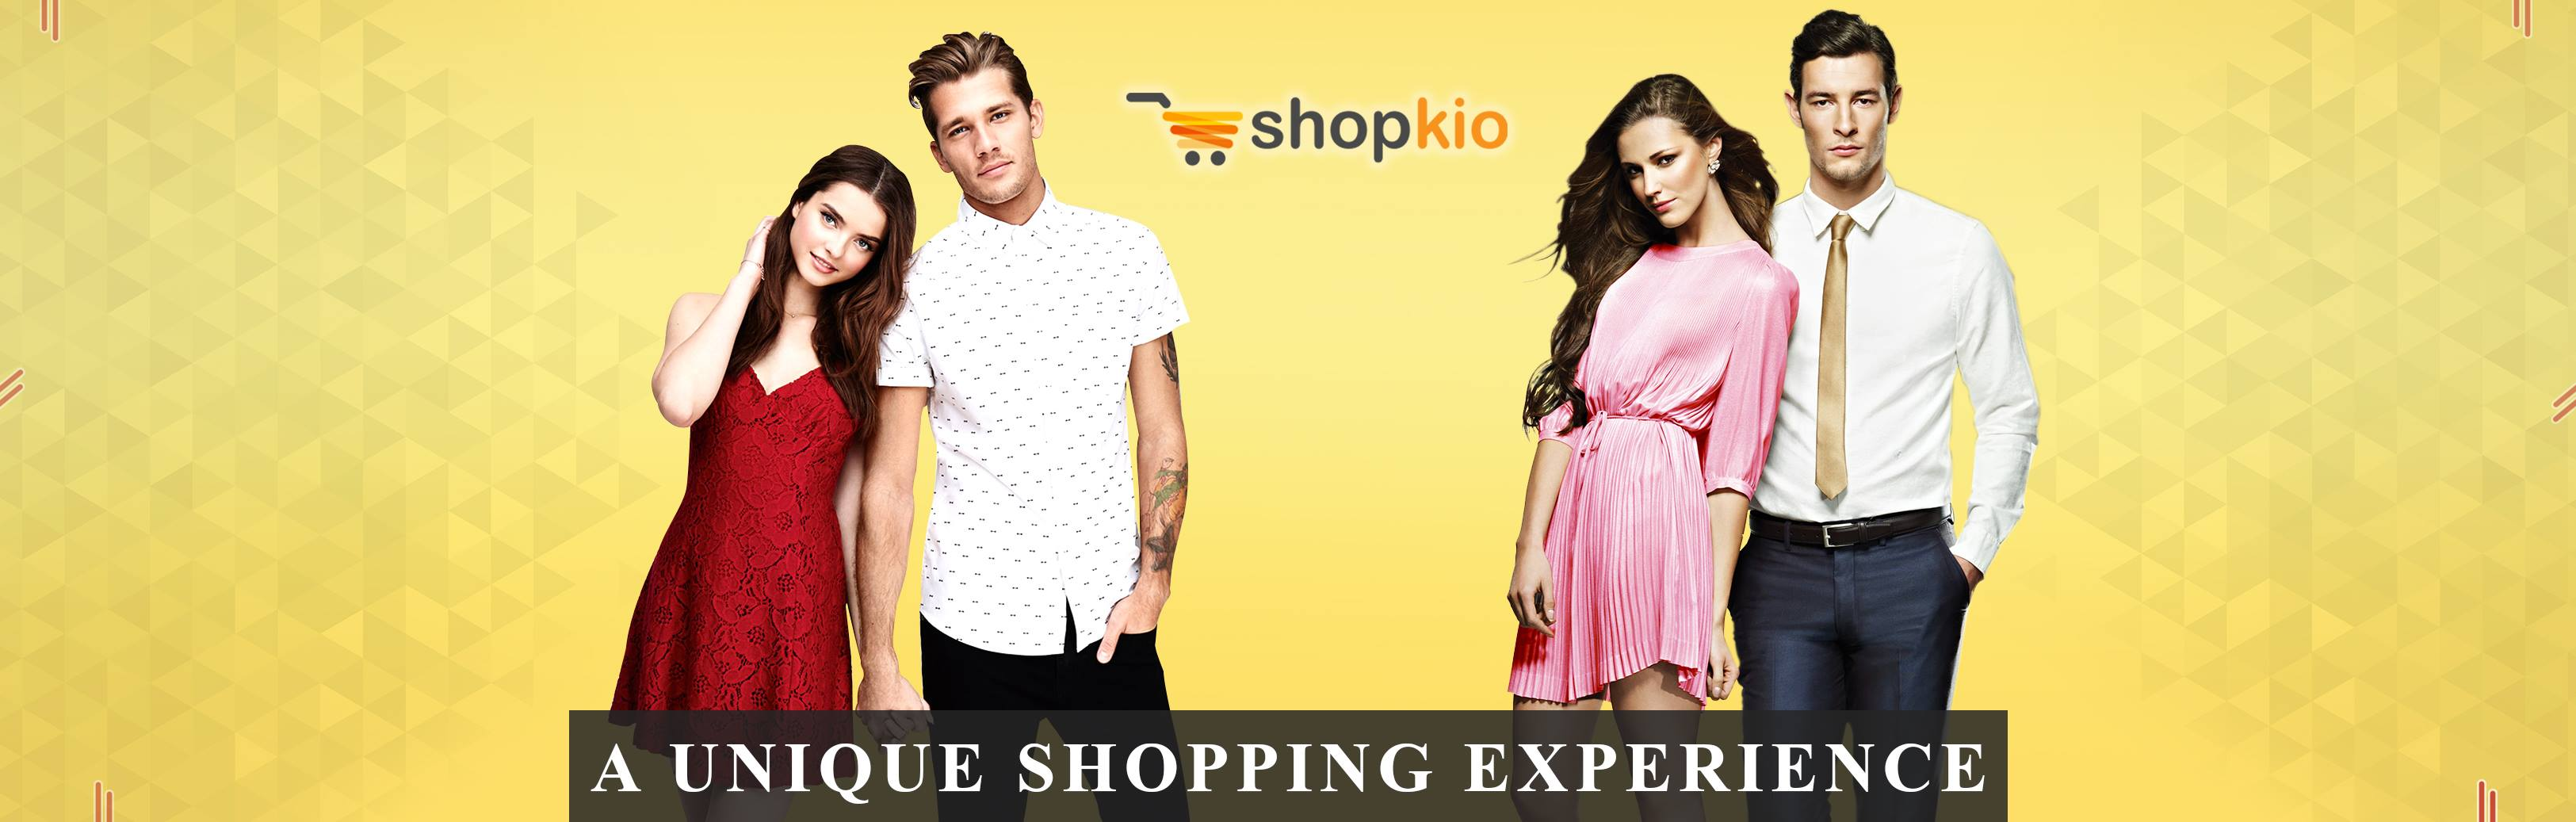 Shopkio online shopping